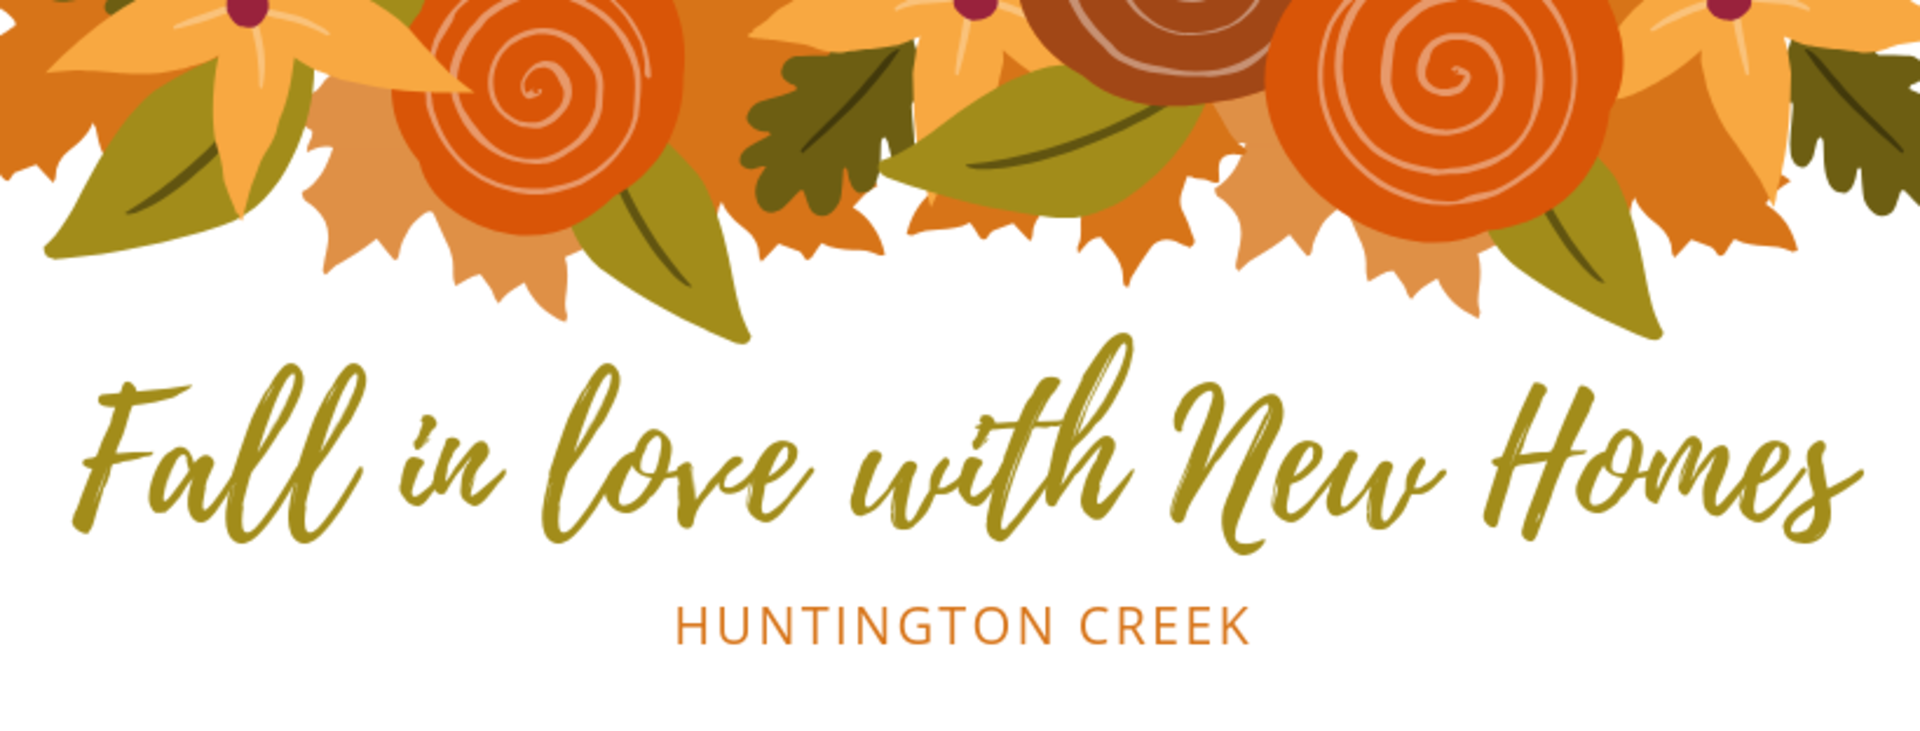 2 Minute Tuesday New Homes Huntington Creek